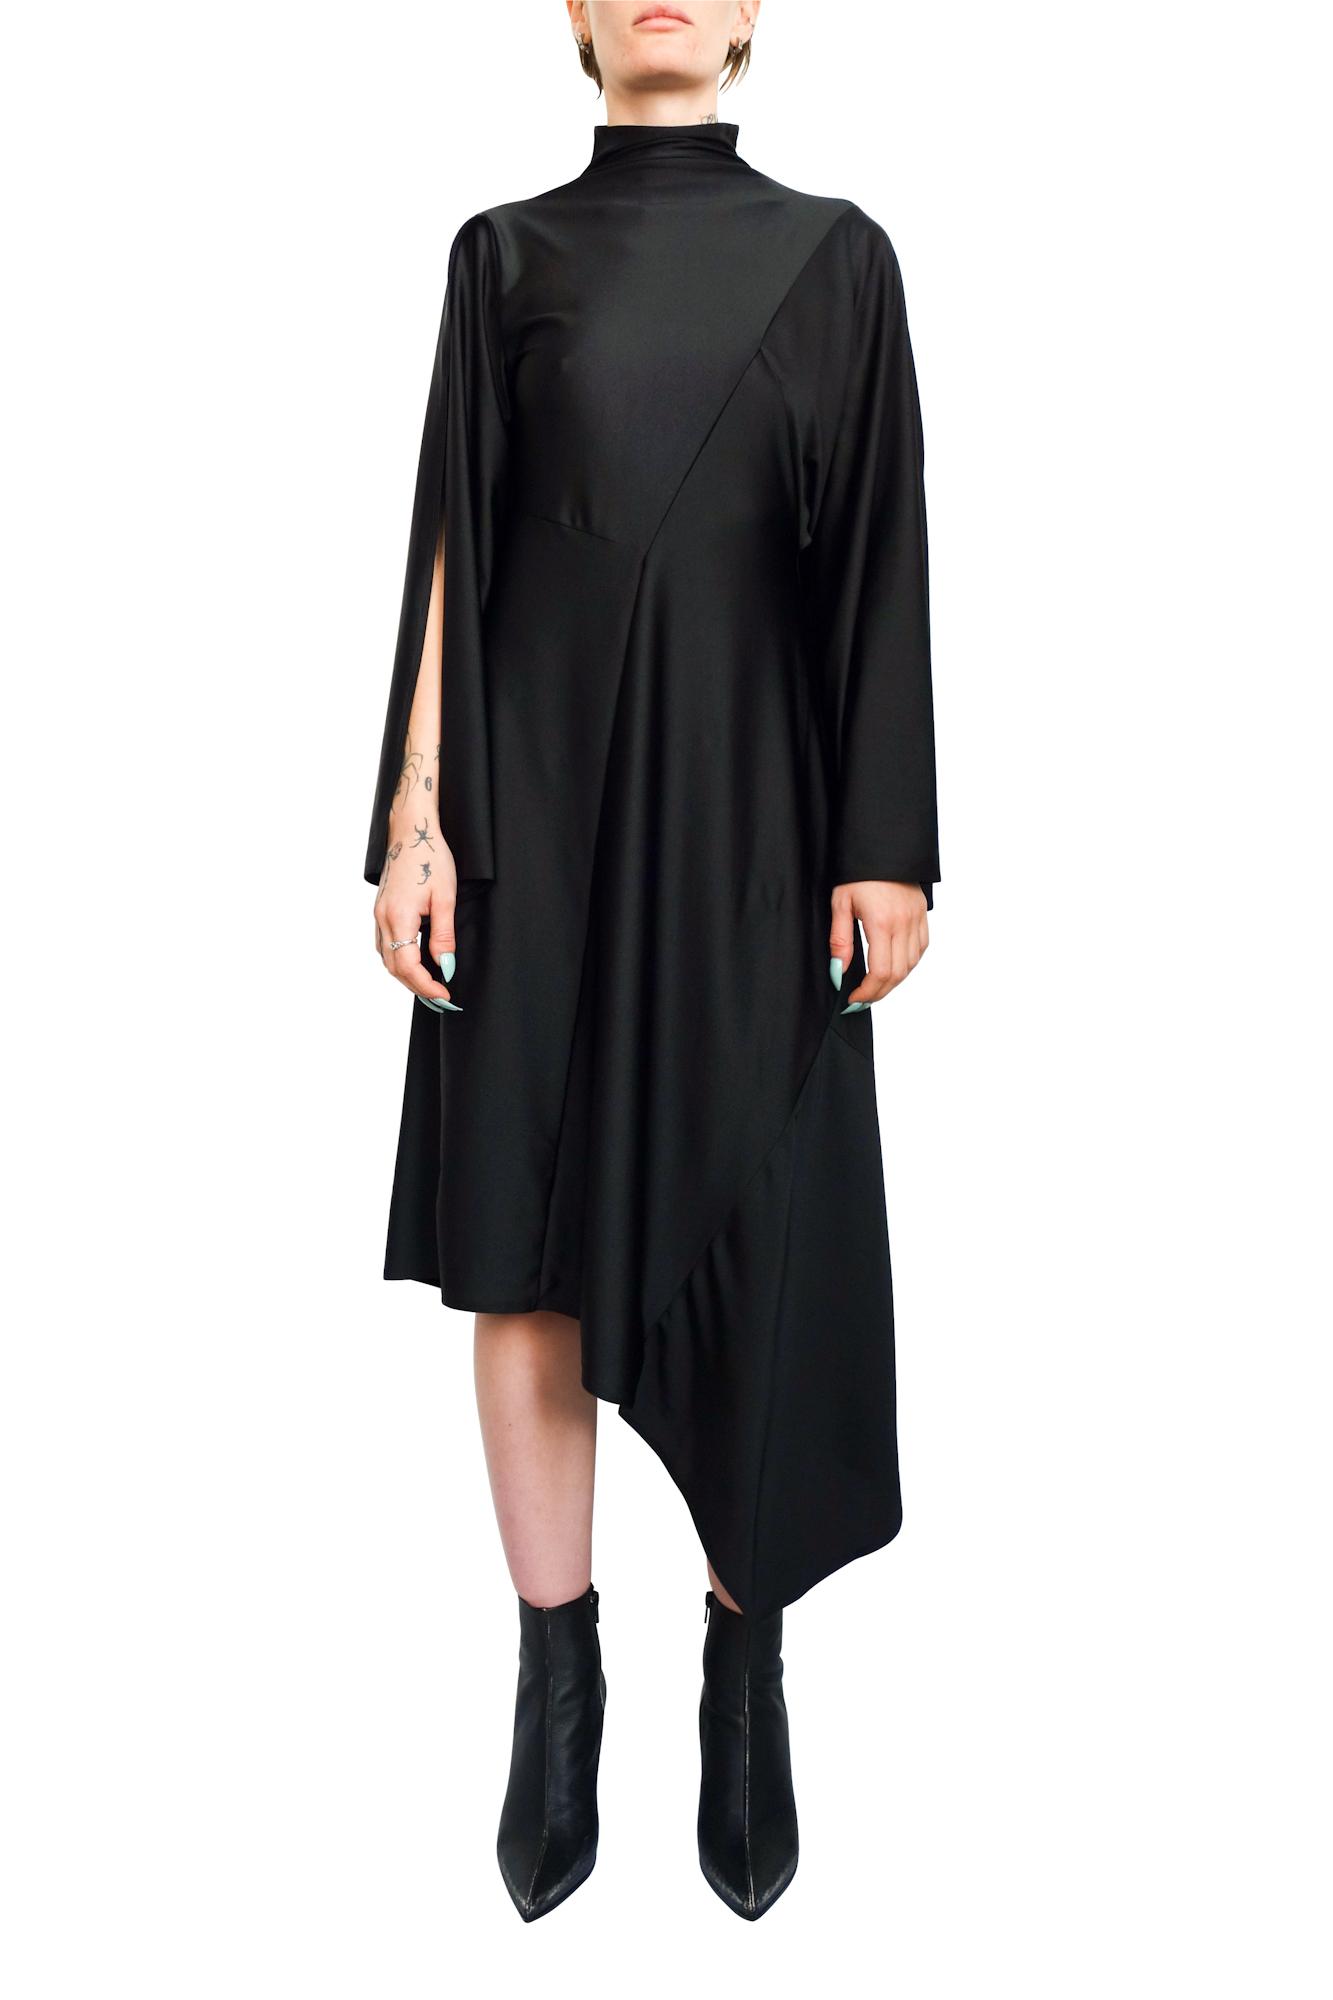 Patchwork Drape Dress